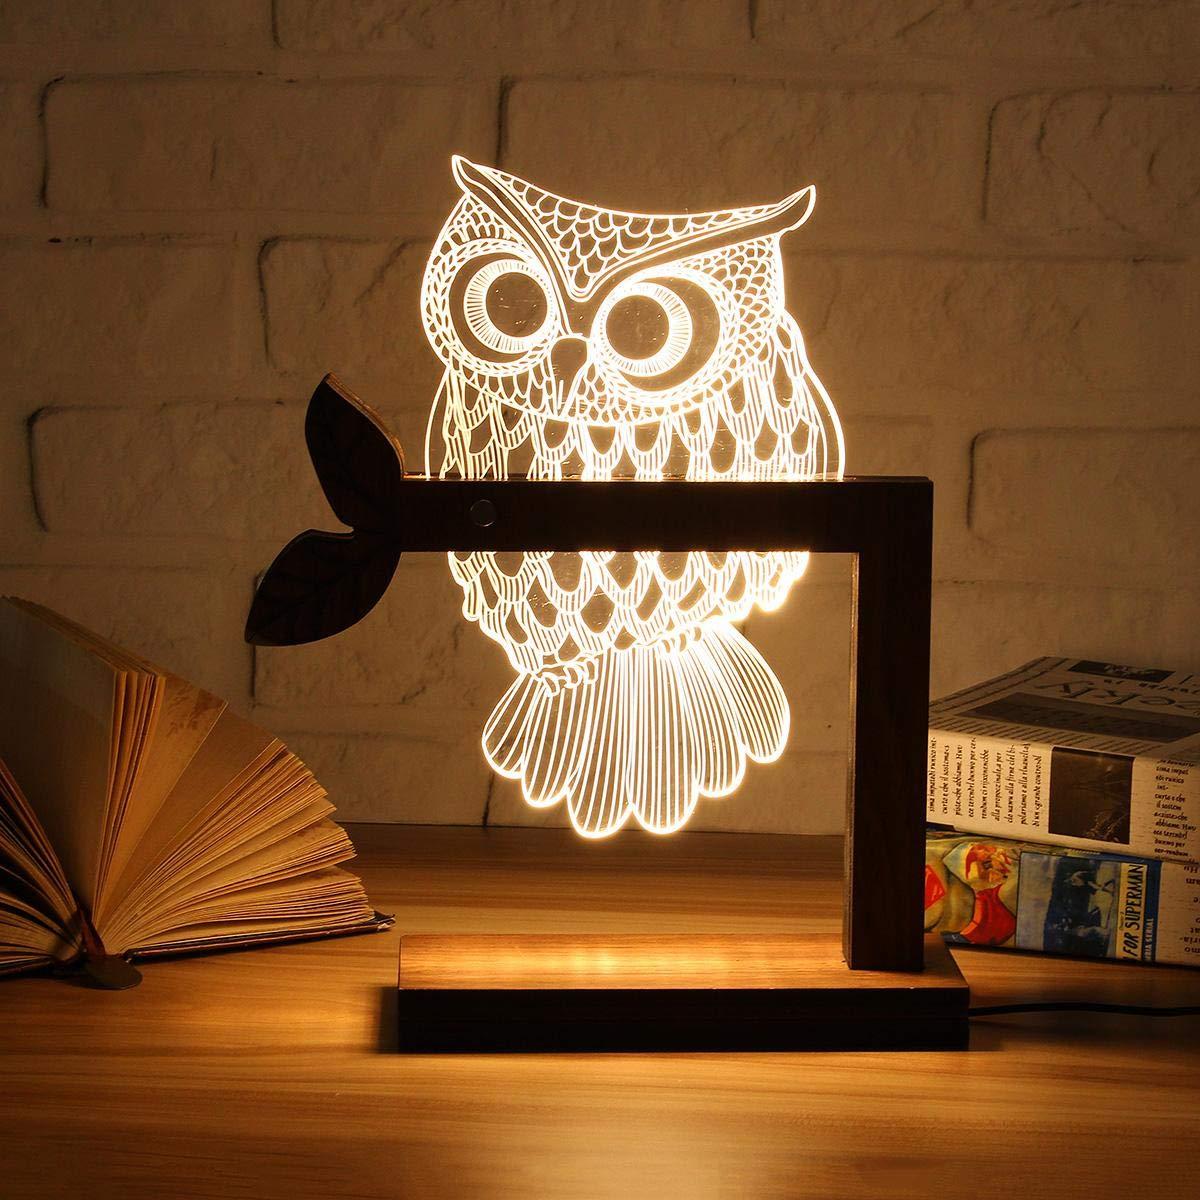 Wooden USB 3D LED Animal Butterfly OWL Night Light Warm Lighting Table Reading Lamps Bedroom Home Decor Birthday Gift,E